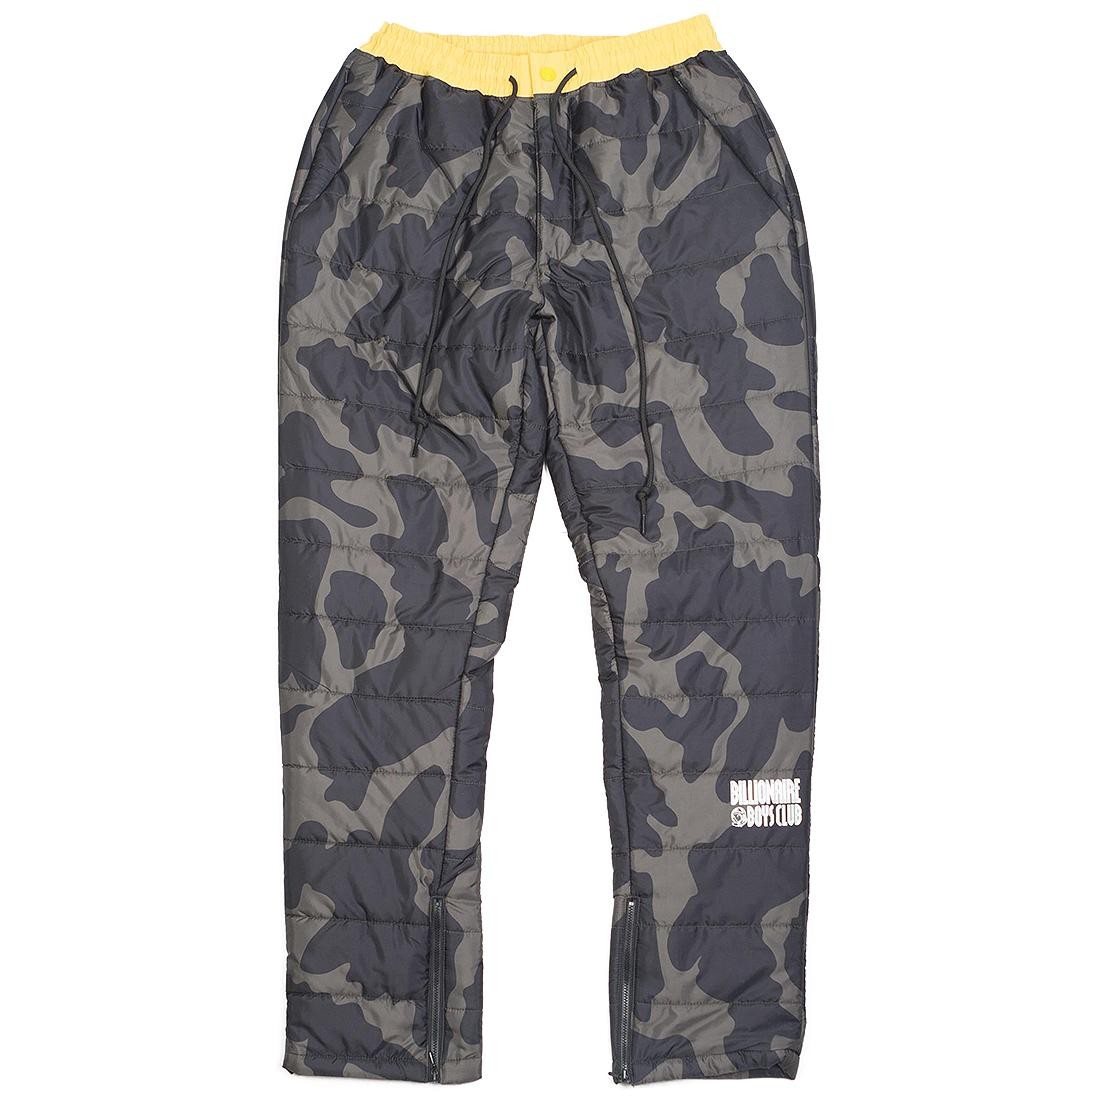 Billionaire Boys Club Men Legend Pants (brown / beluga)